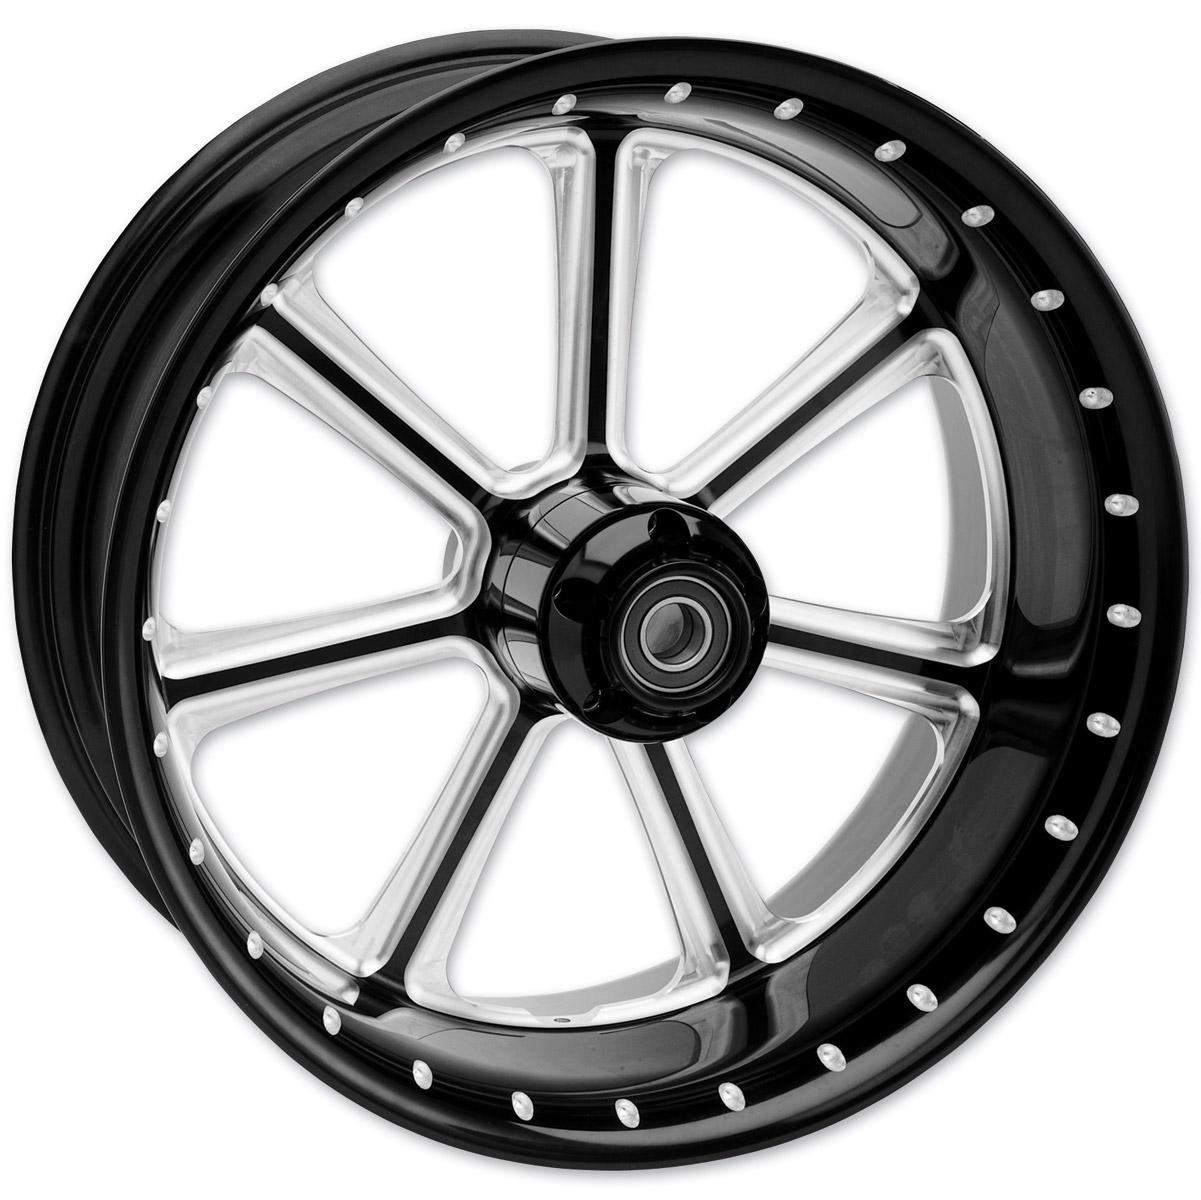 Roland Sands Design Contrast Cut Diesel Rear Wheel, 18 x 5.5